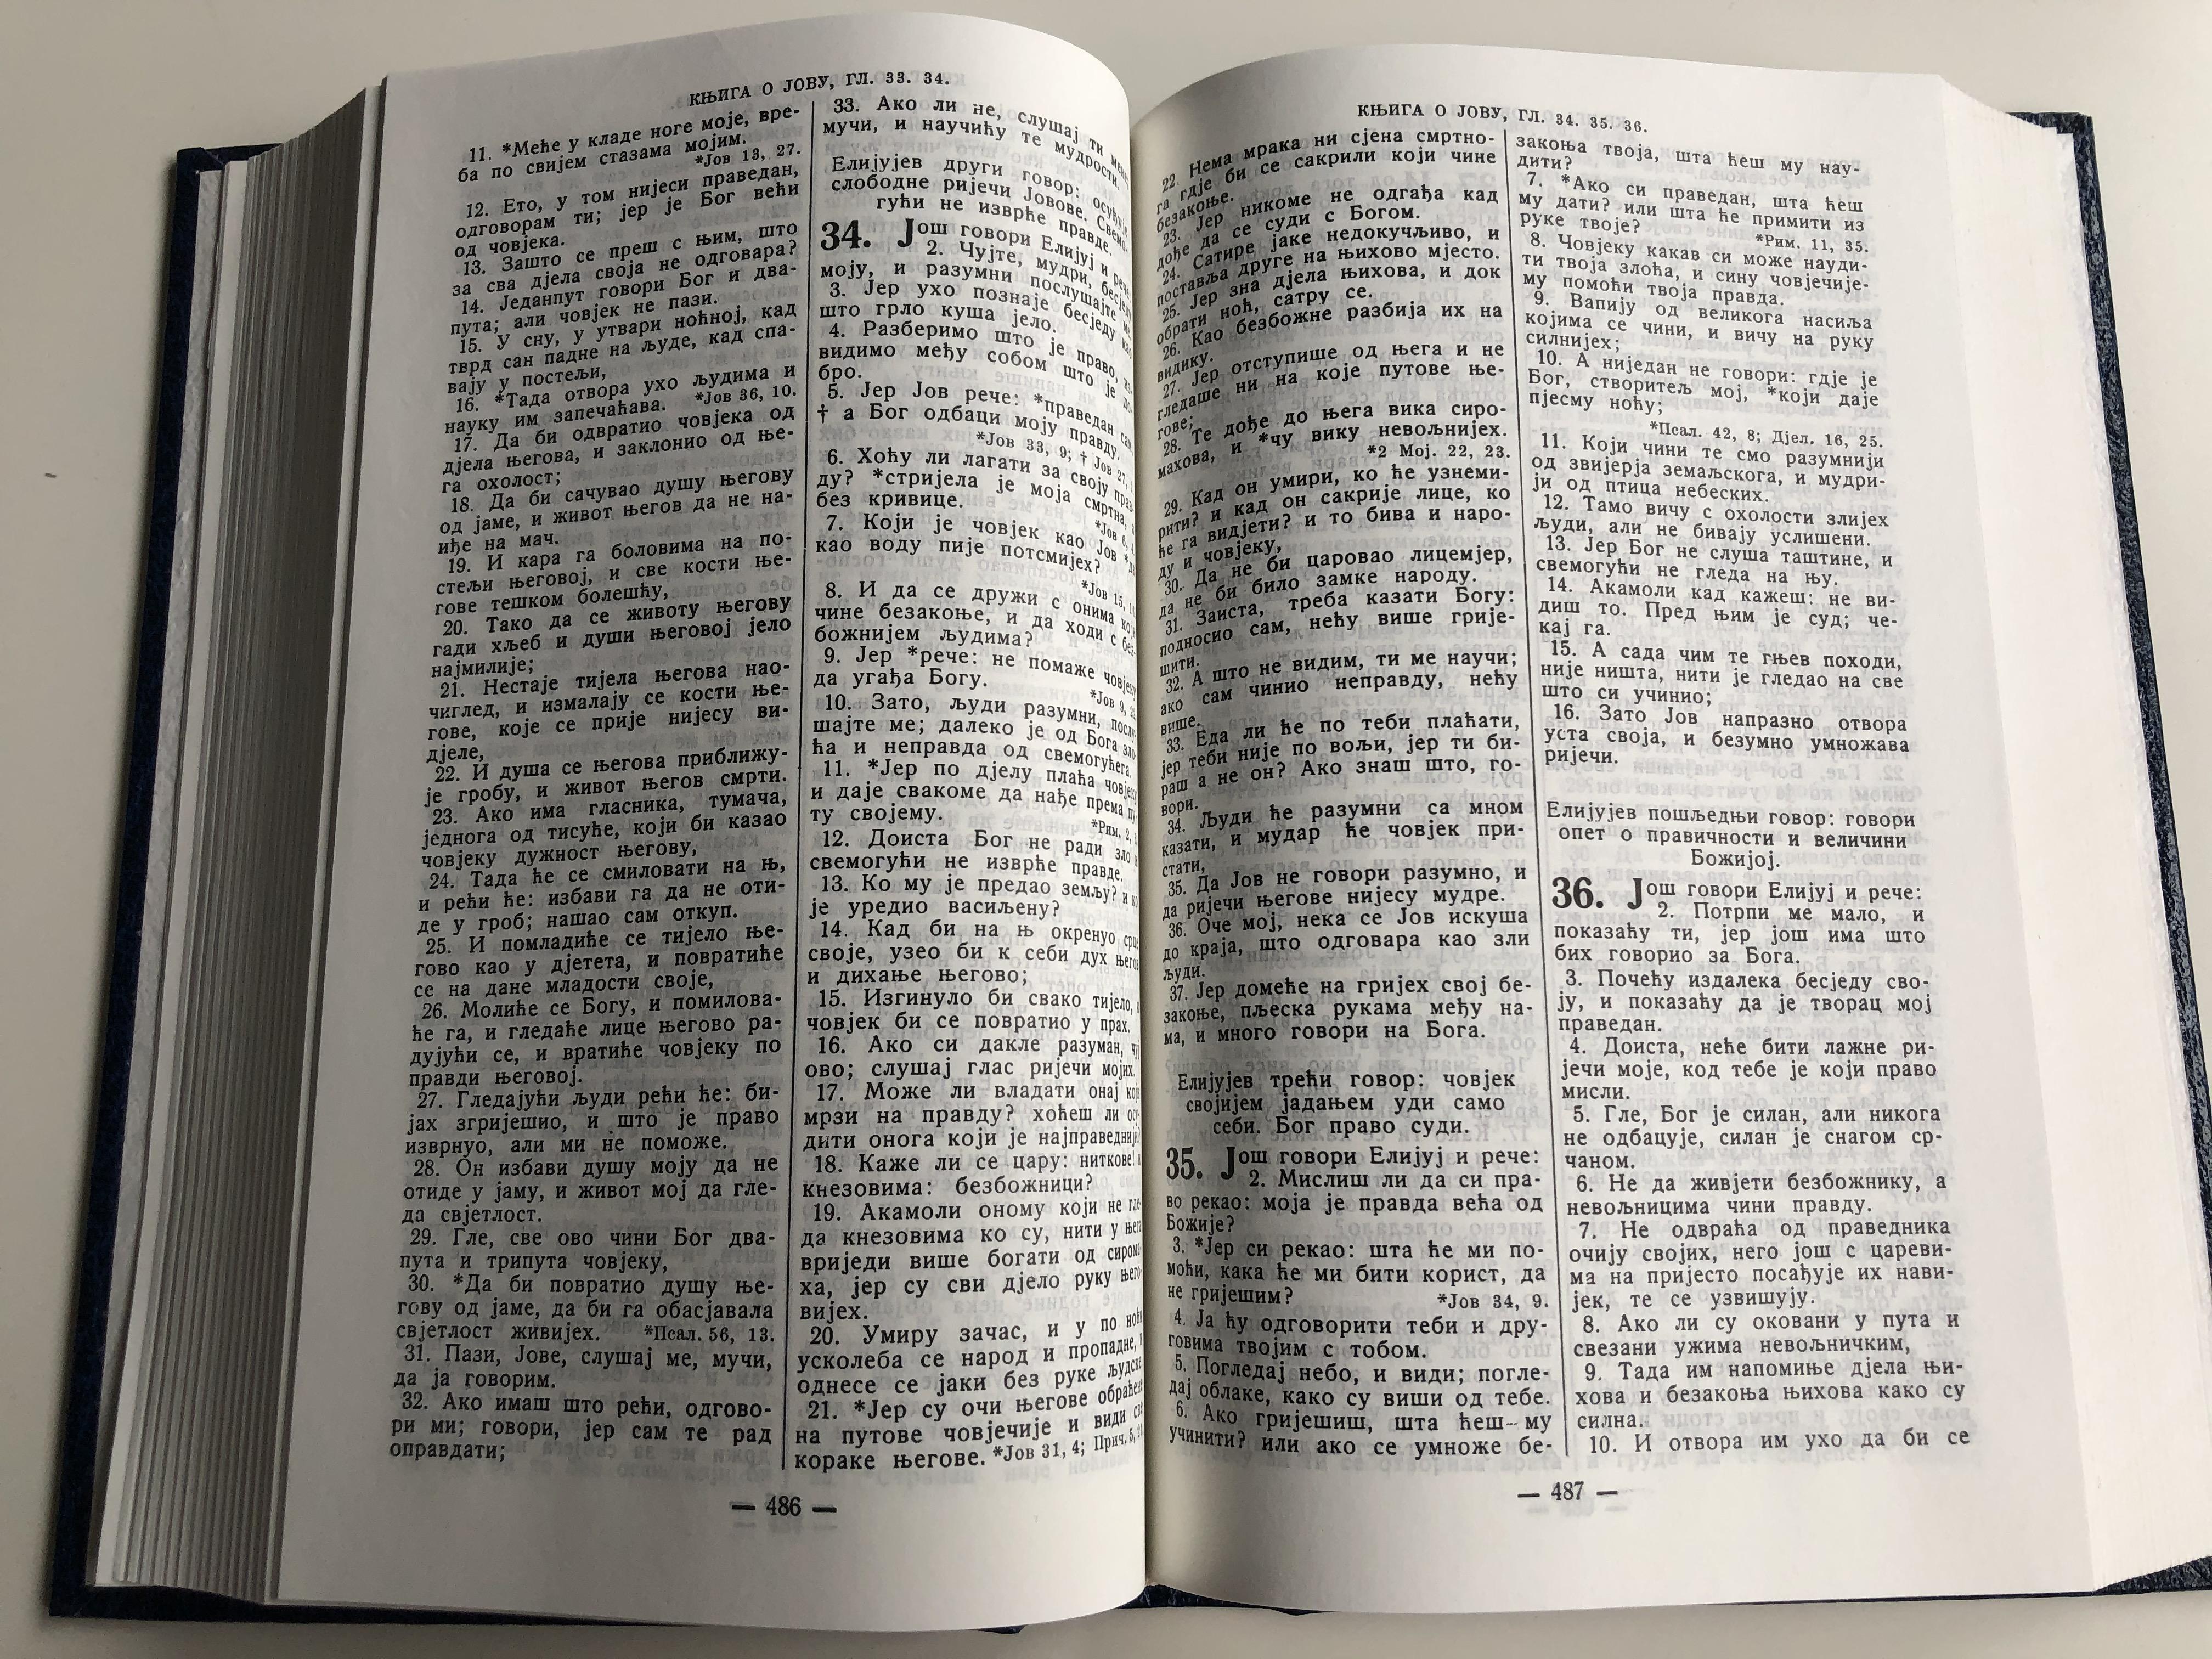 serbian-bible-sveto-pismo-biblija-043-blue-hardcover-9.jpg